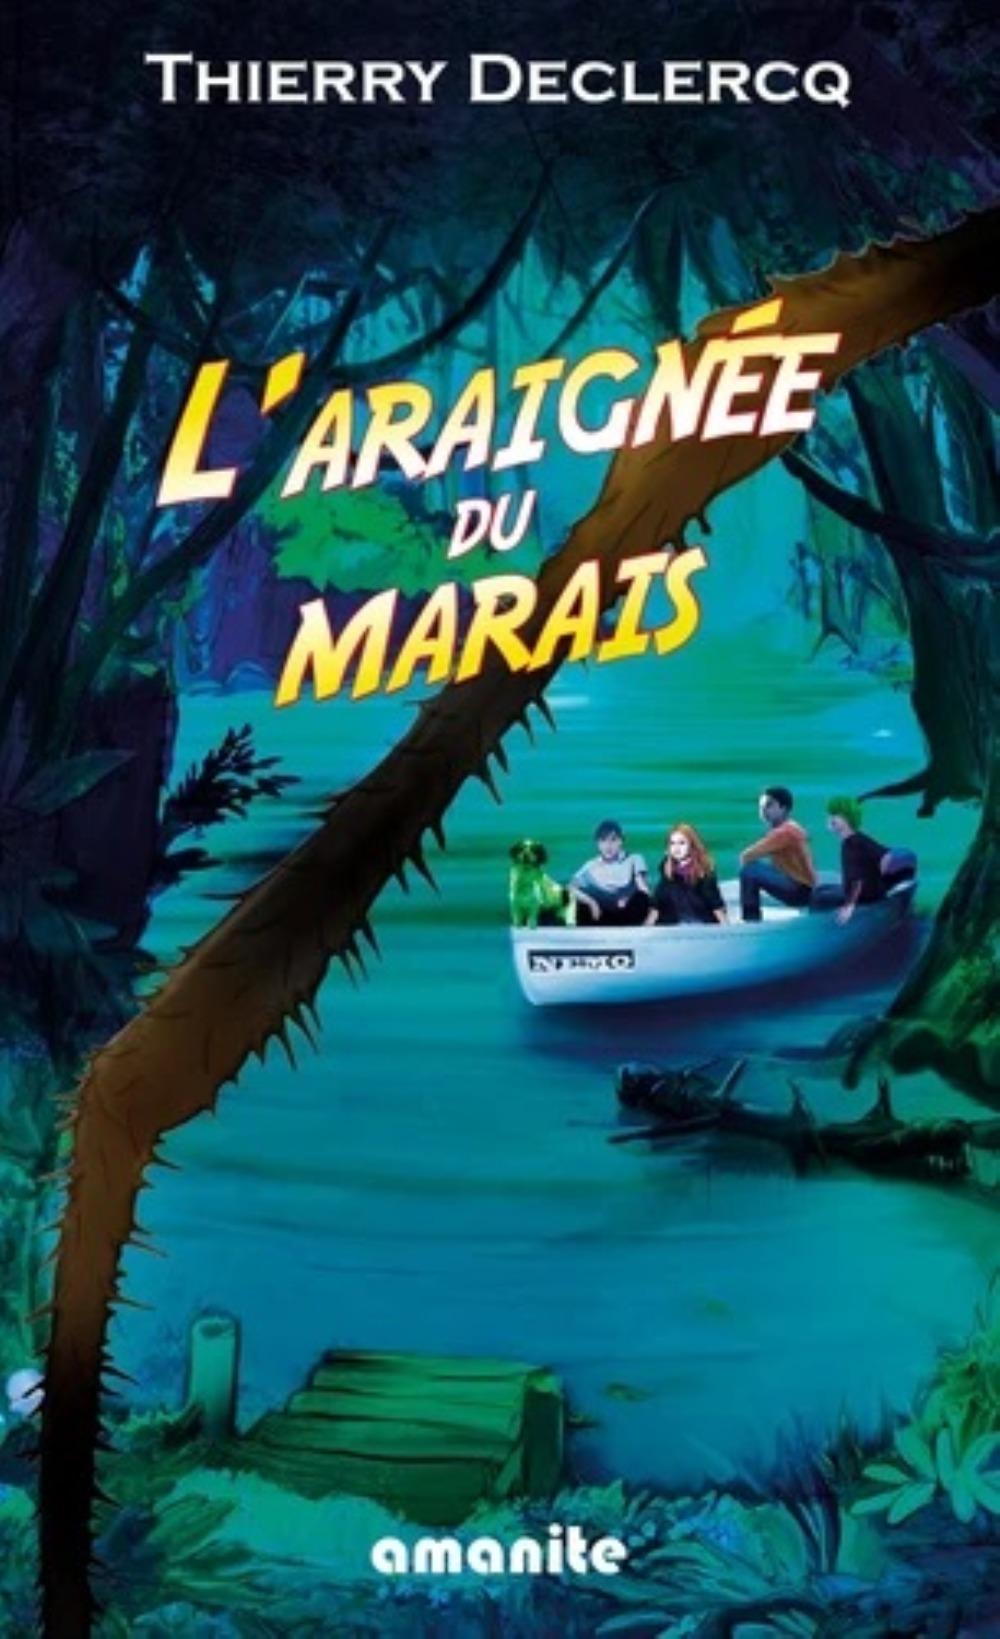 L'ARAIGNEE DU MARAIS